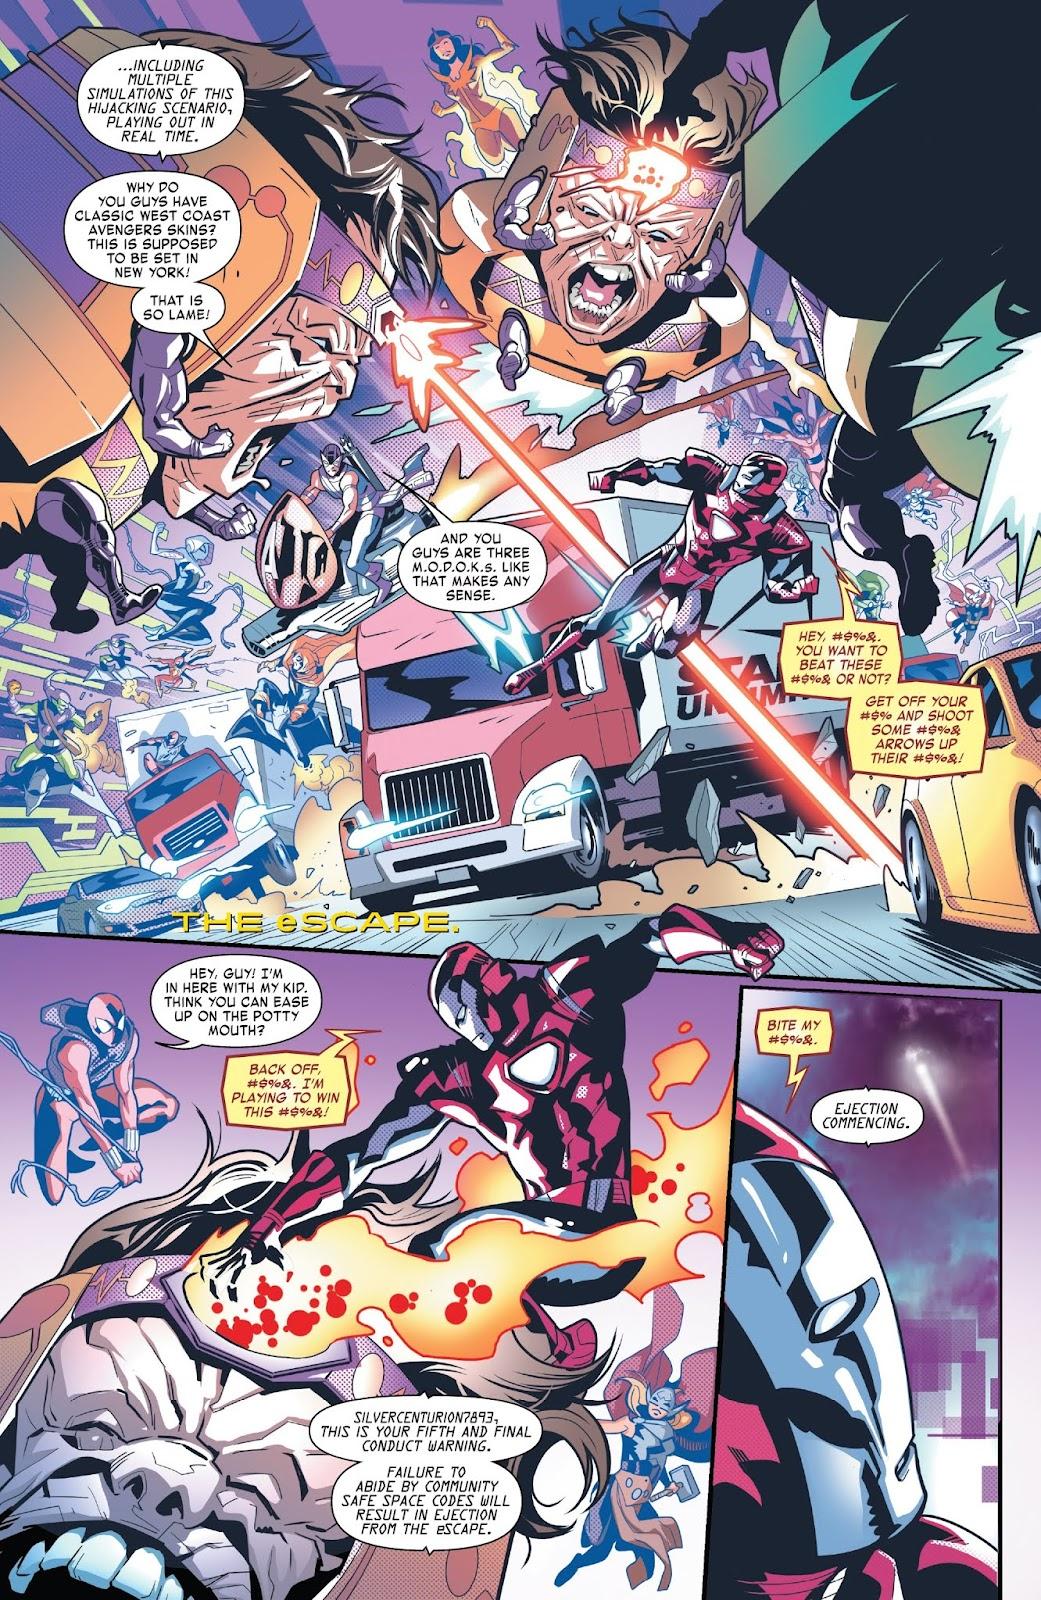 Read online Tony Stark: Iron Man comic -  Issue #6 - 8